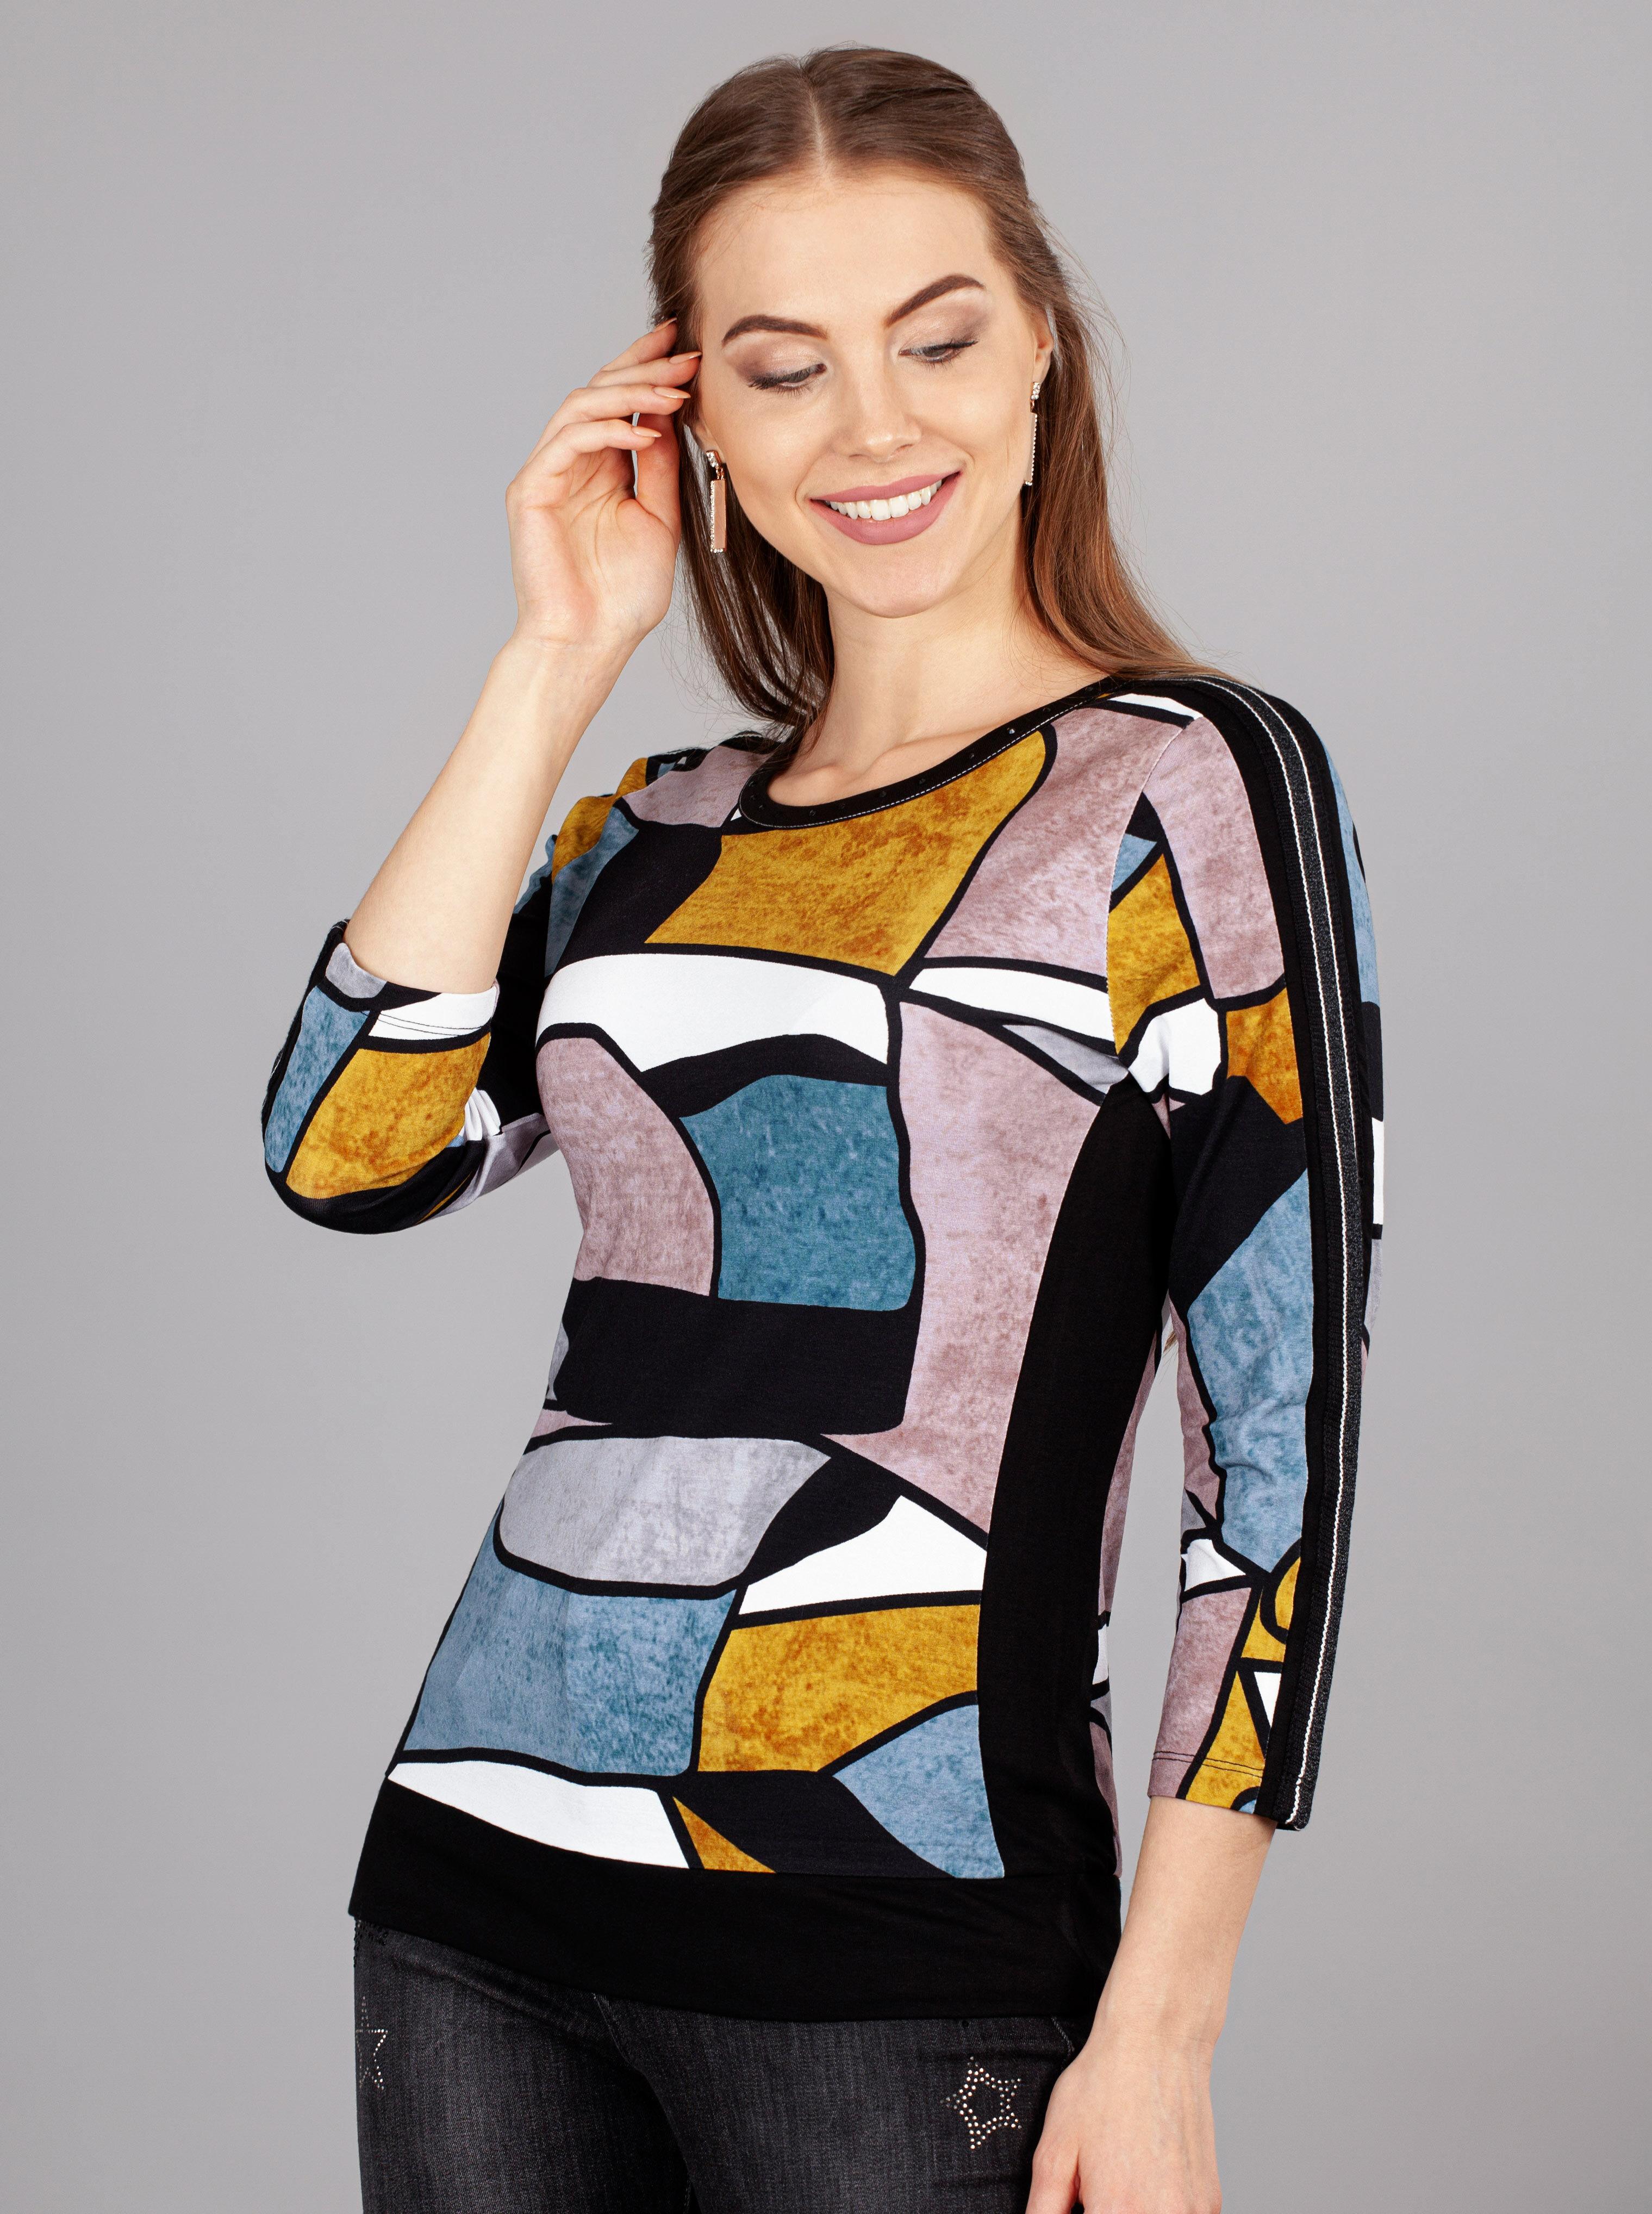 Simply Art Dolcezza: Lost In Time Fancy Wearable Art T-Shirt Dolcezza_simplyart_70691